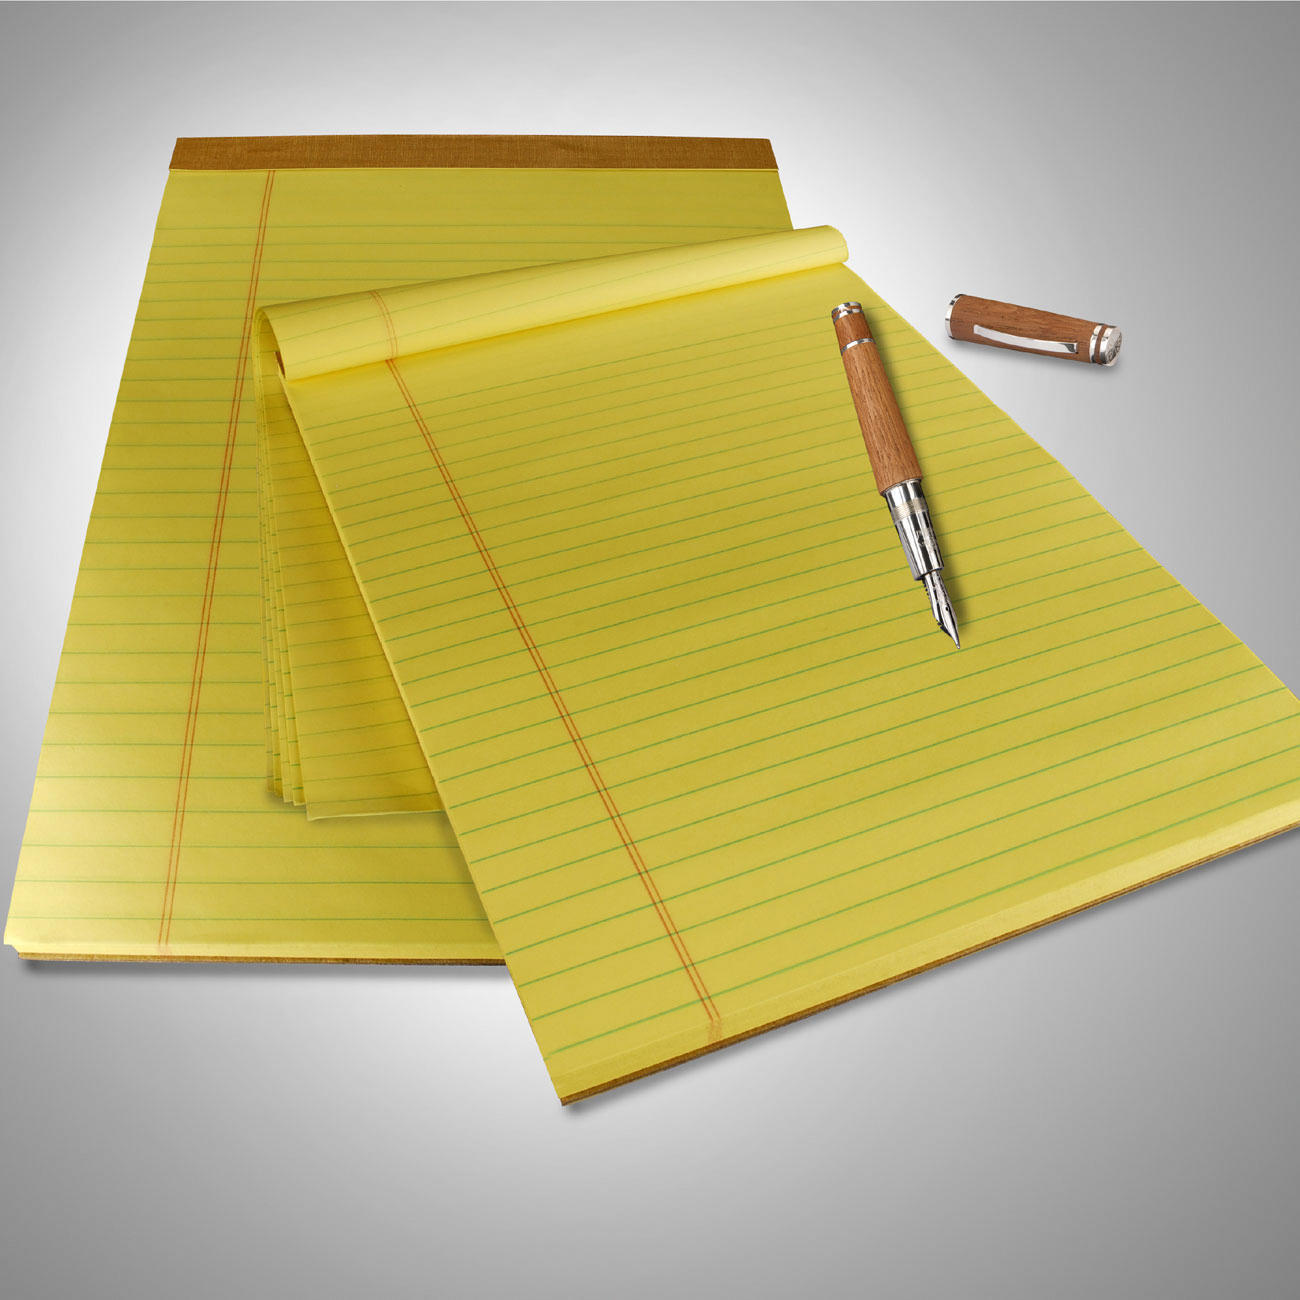 Buy Original U.S. Legal Pads, 9 Pads @ 100 pages